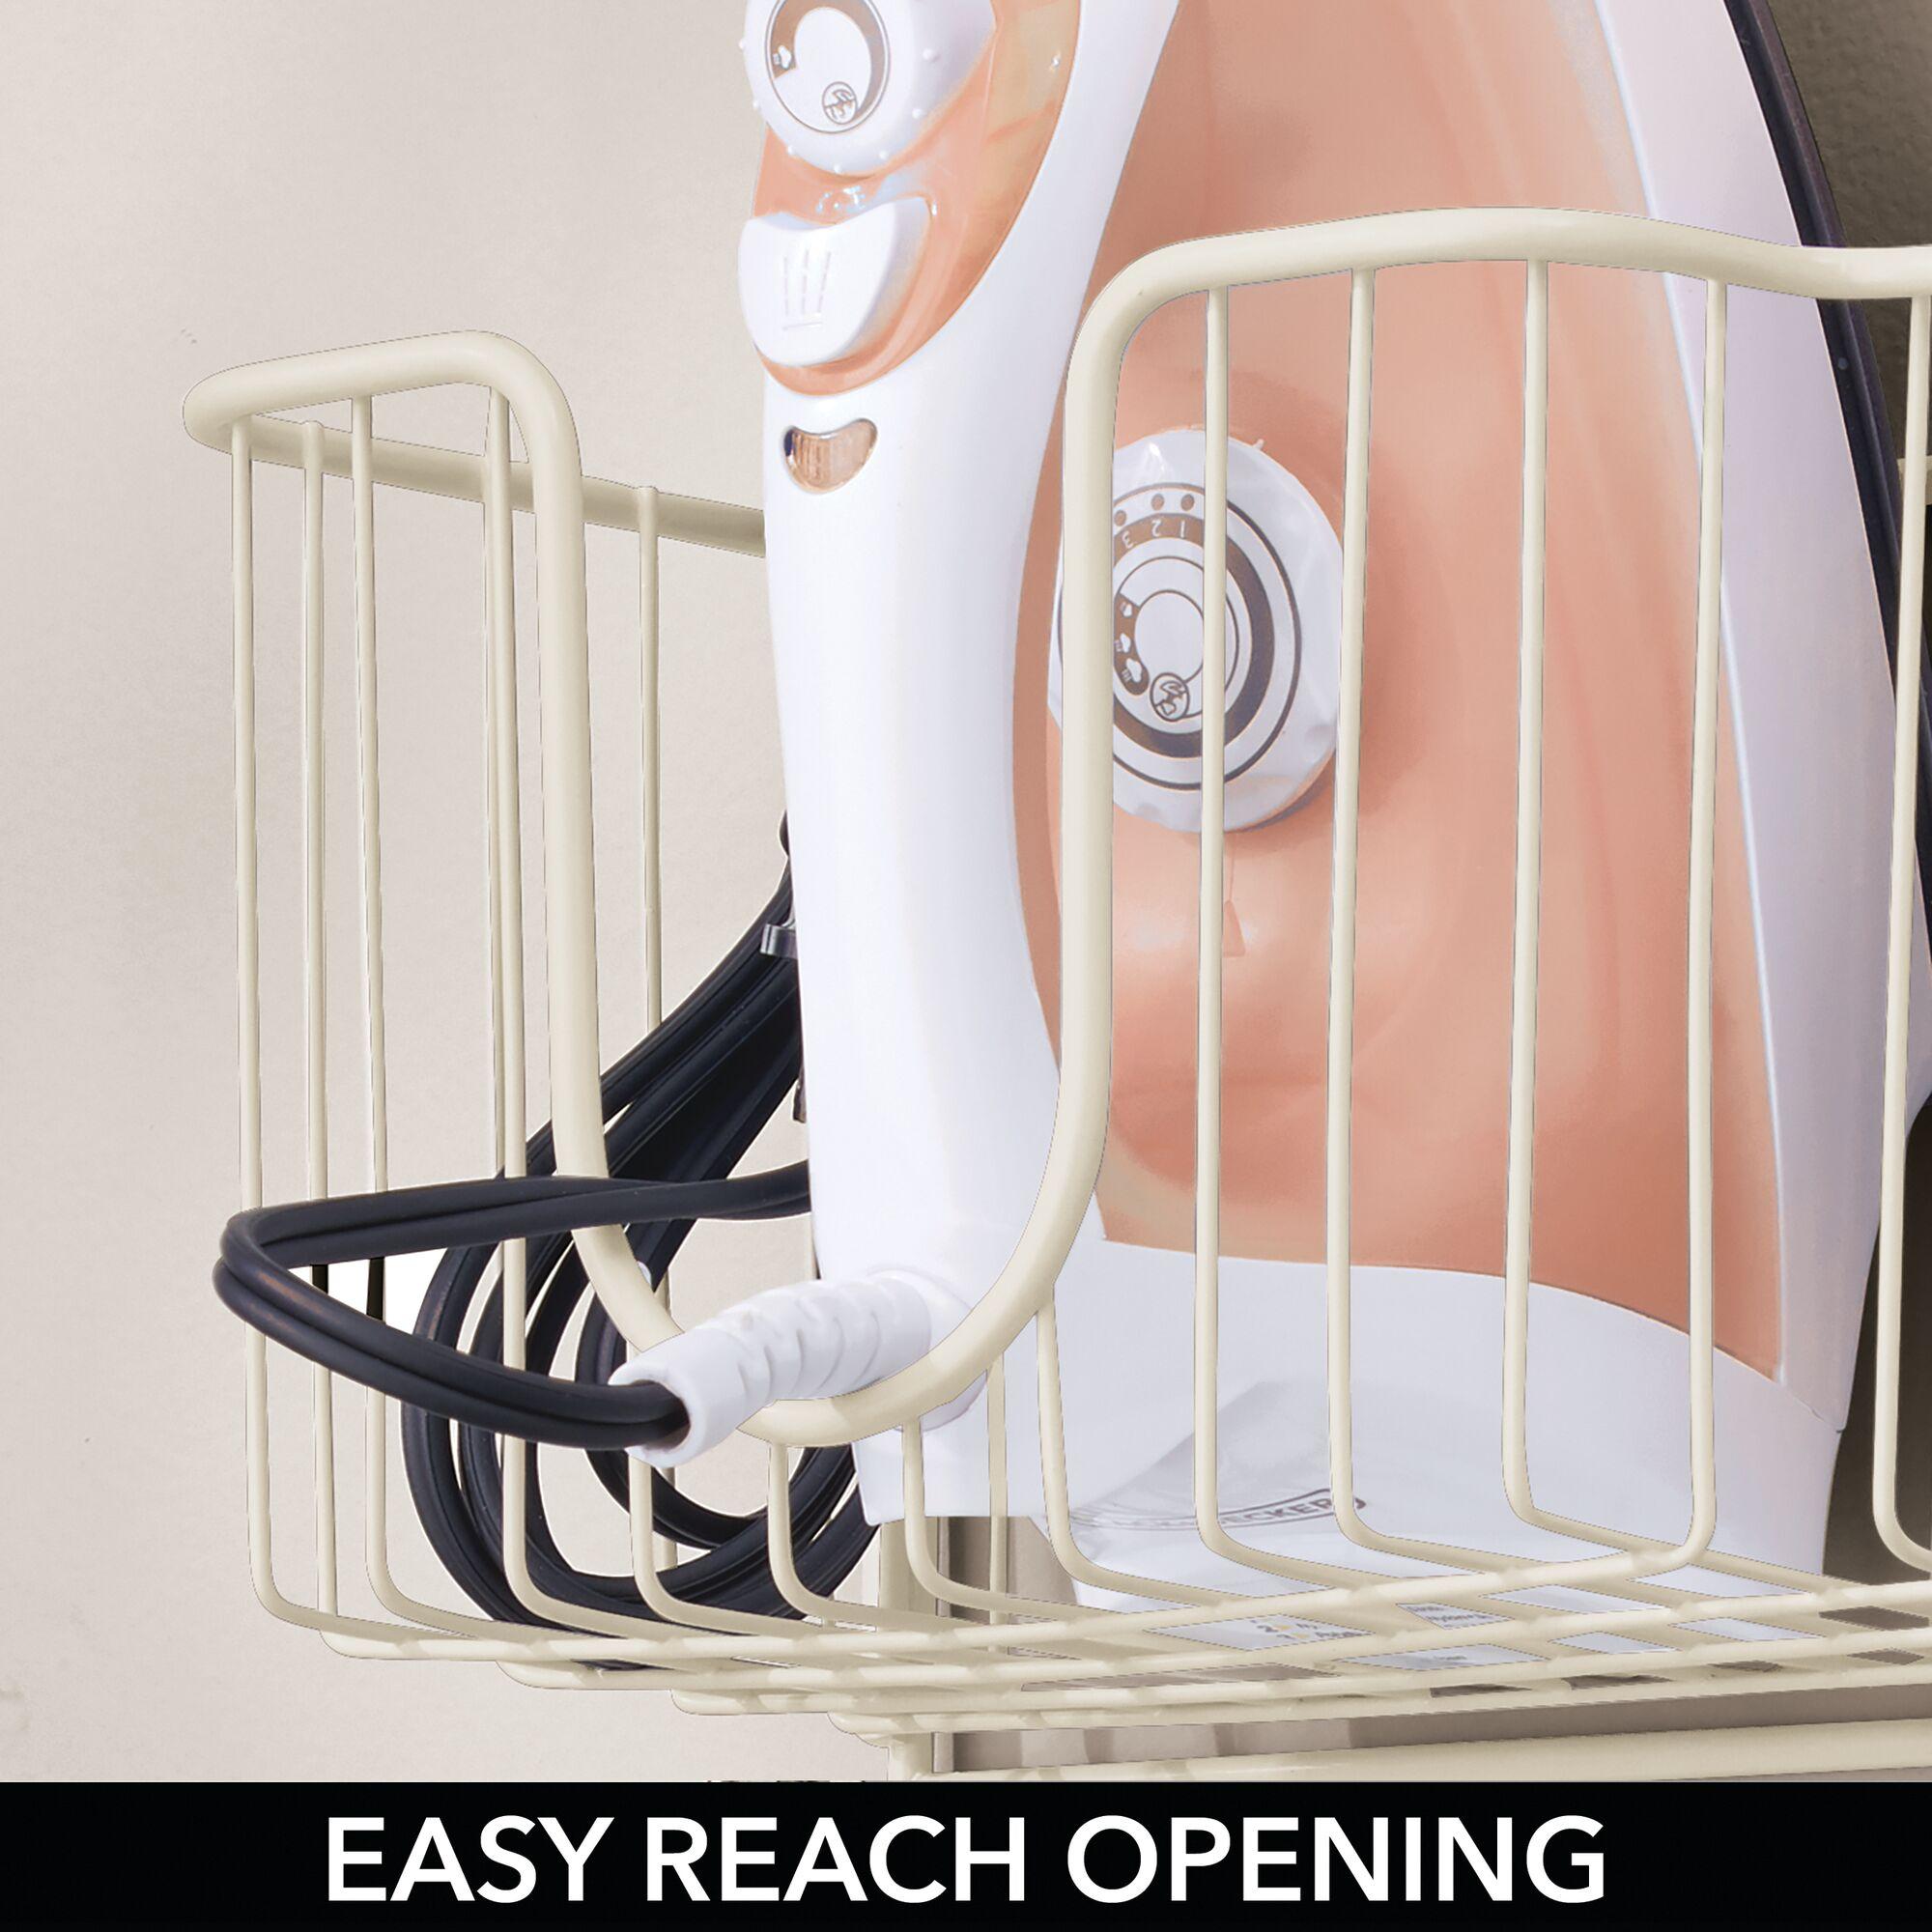 mDesign-Wall-Mount-Ironing-Board-Holder-Large-Storage-Basket thumbnail 49